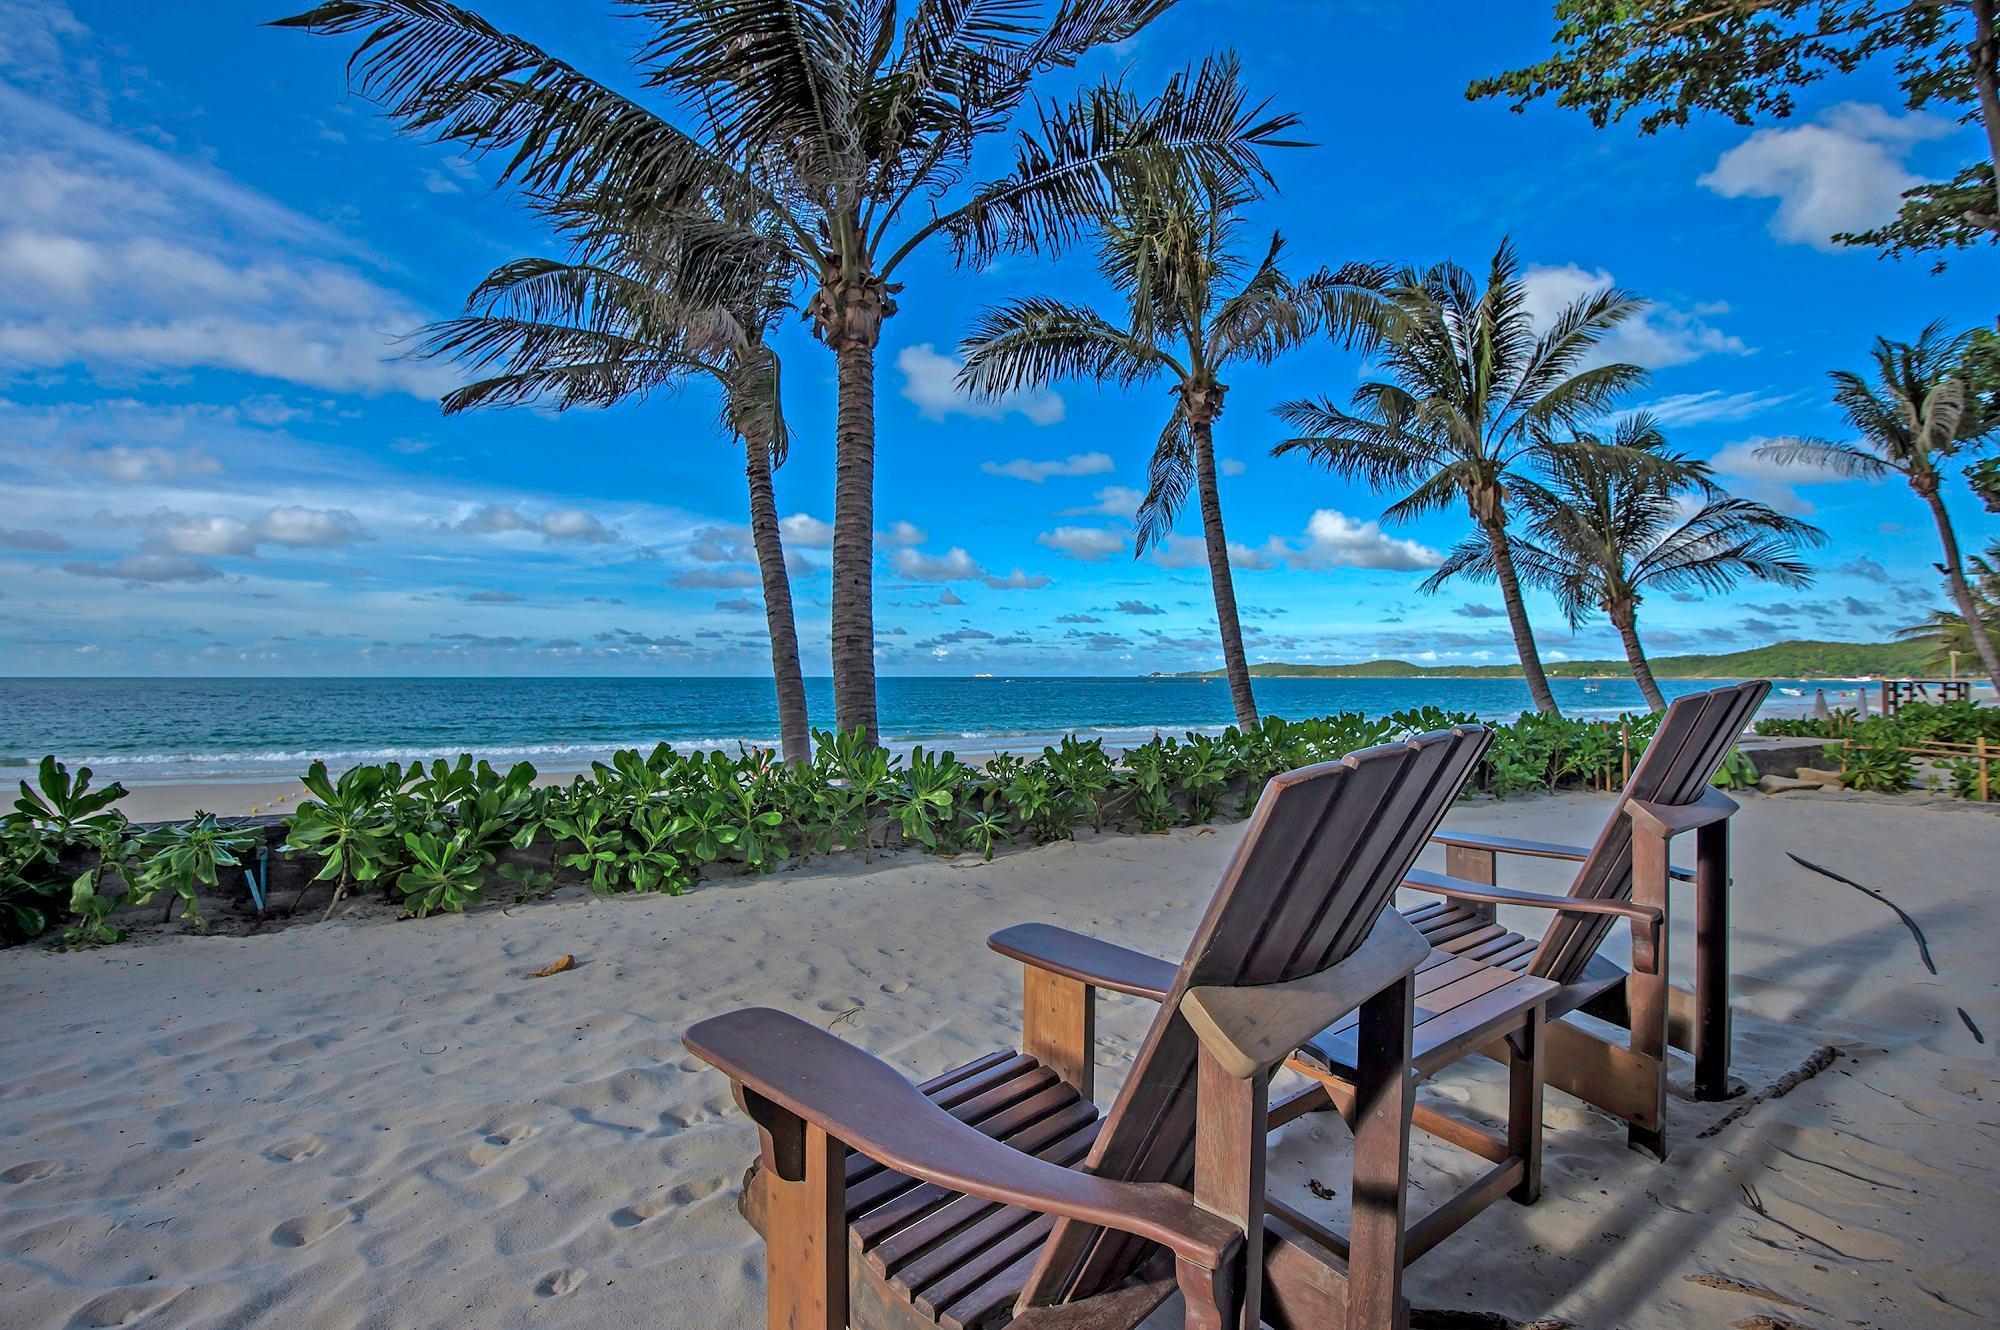 Sai Kaew Beach Resort ทรายแก้ว บีช รีสอร์ท